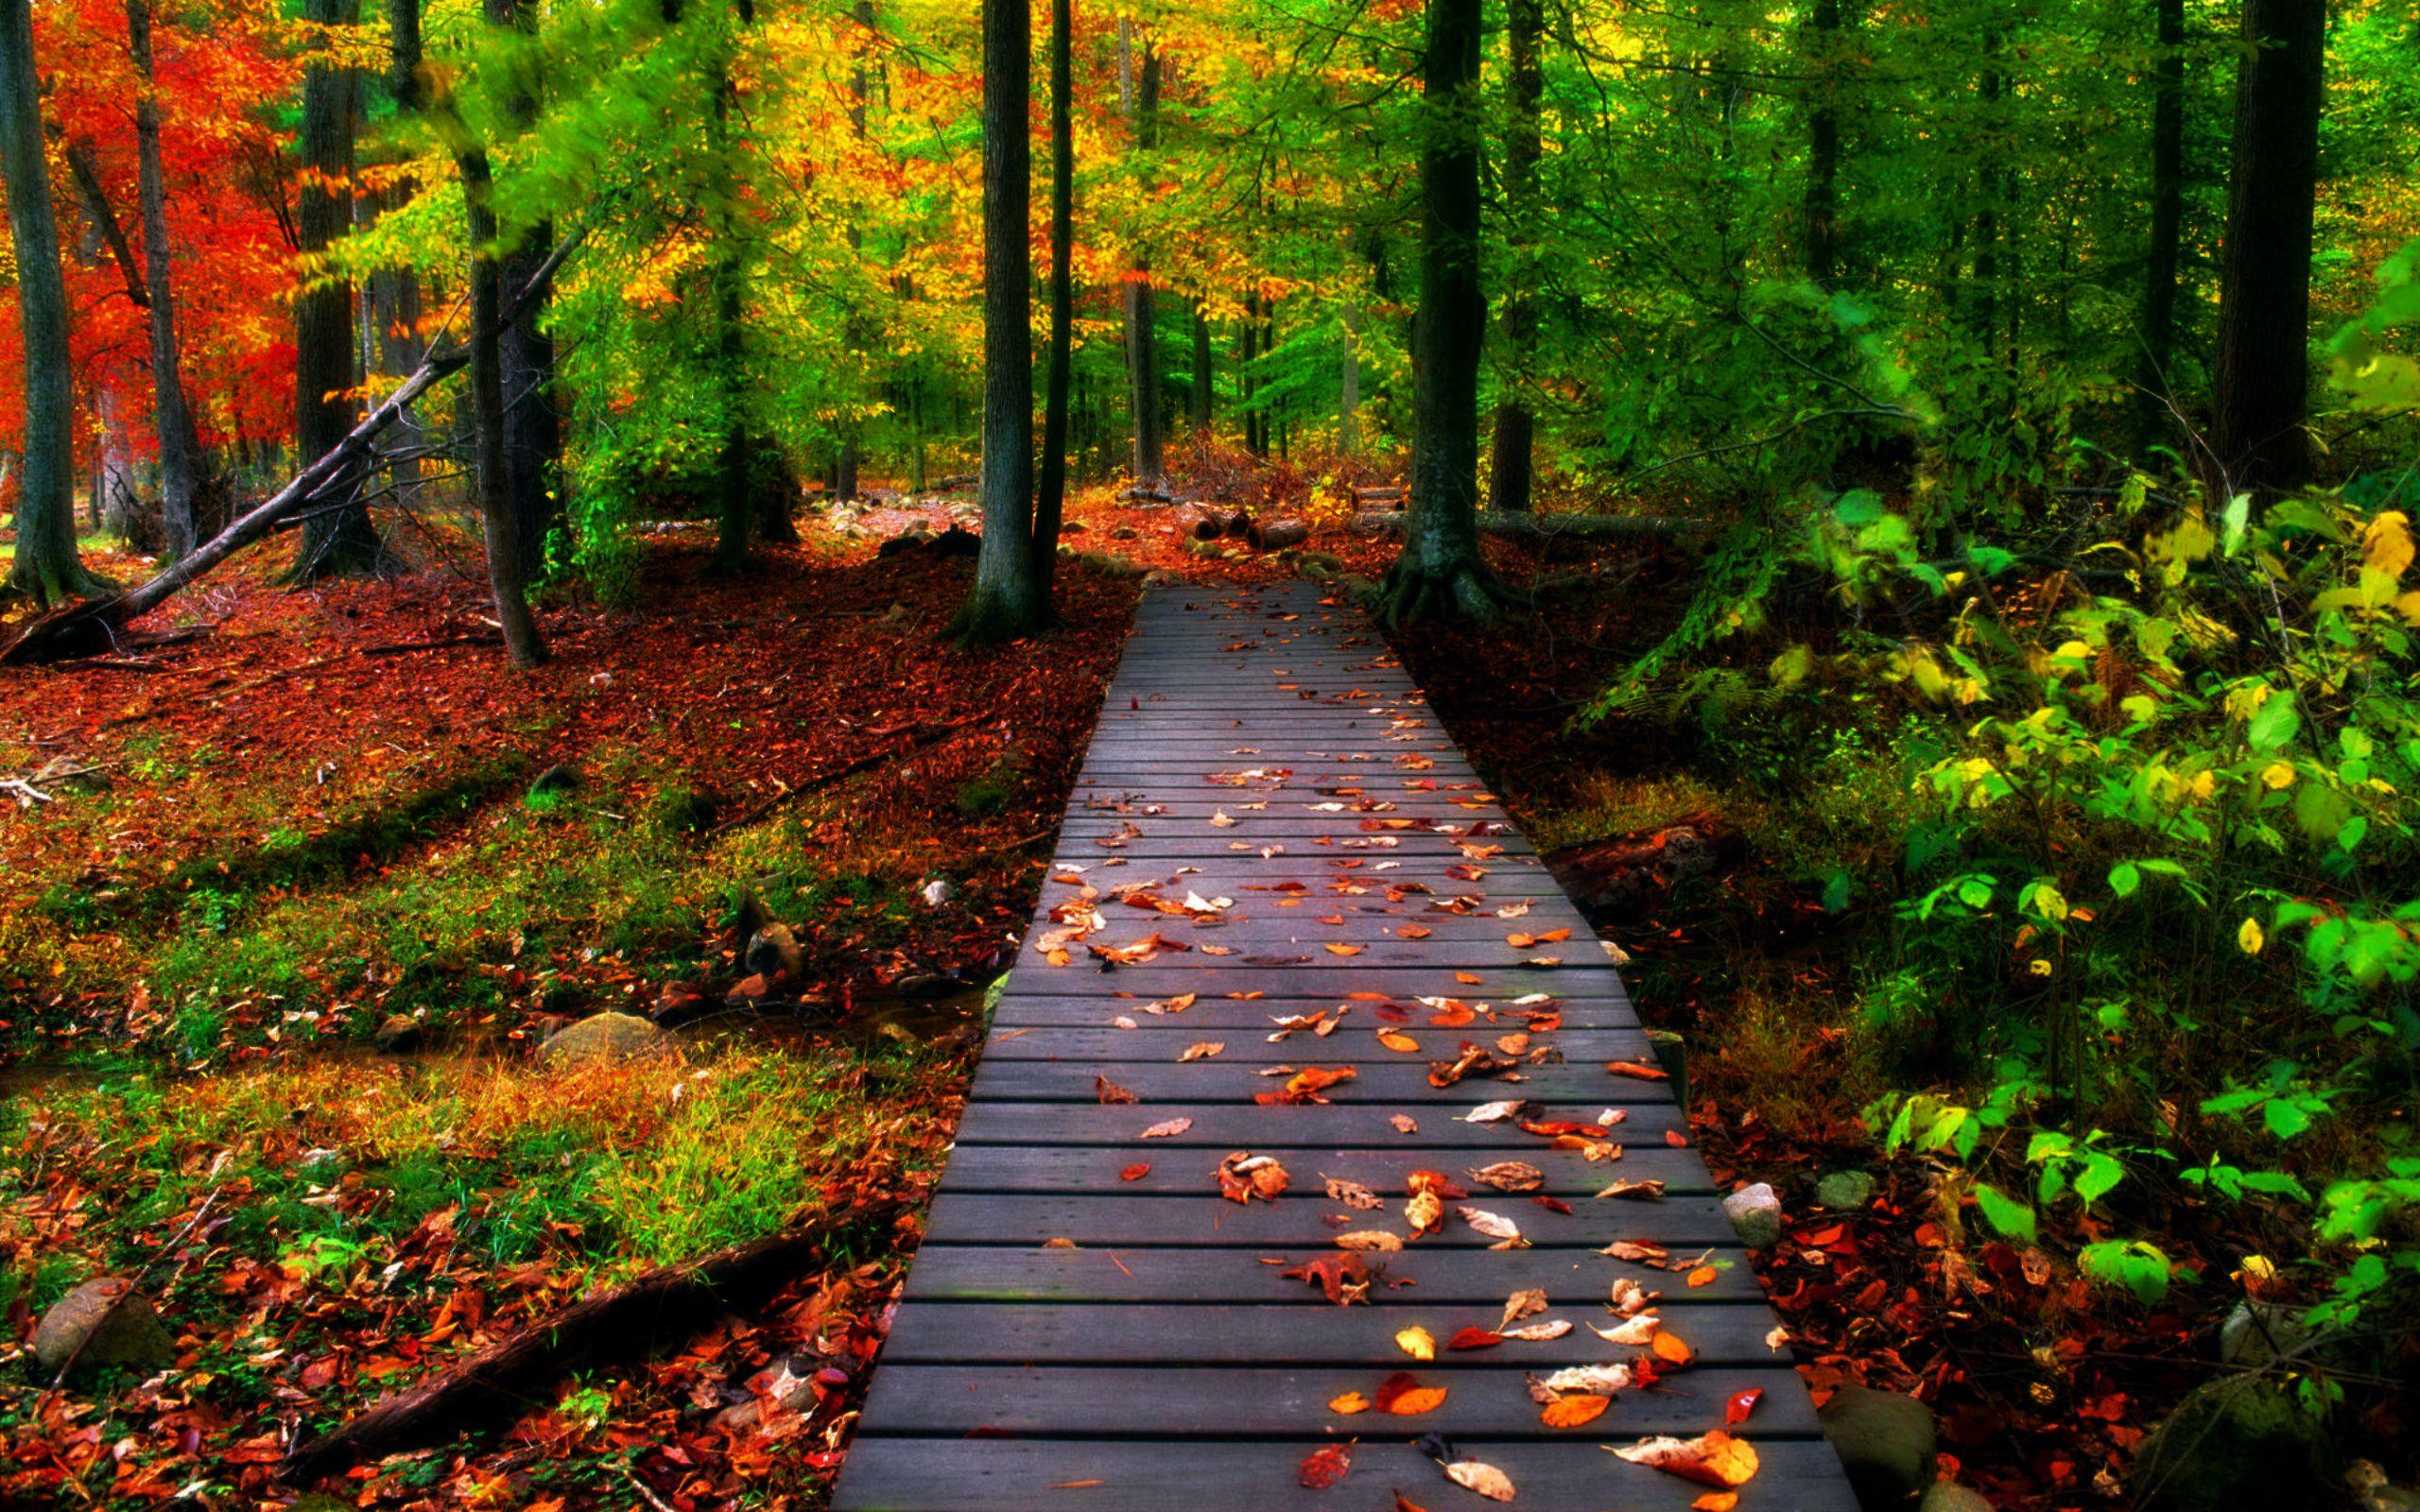 Autumn view 2560x1600 wallpaper nature desktop - Nature wallpaper 2560x1600 ...